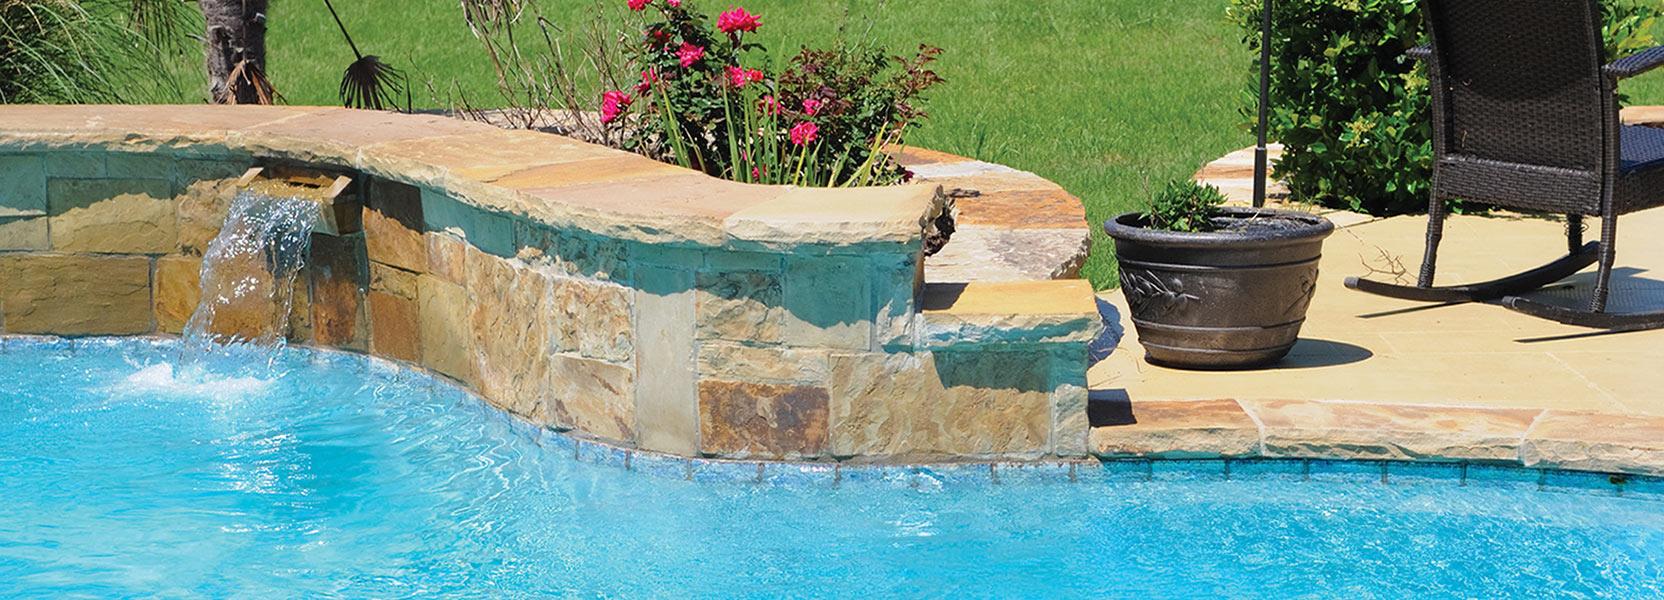 Horizon Pool Residential Pool